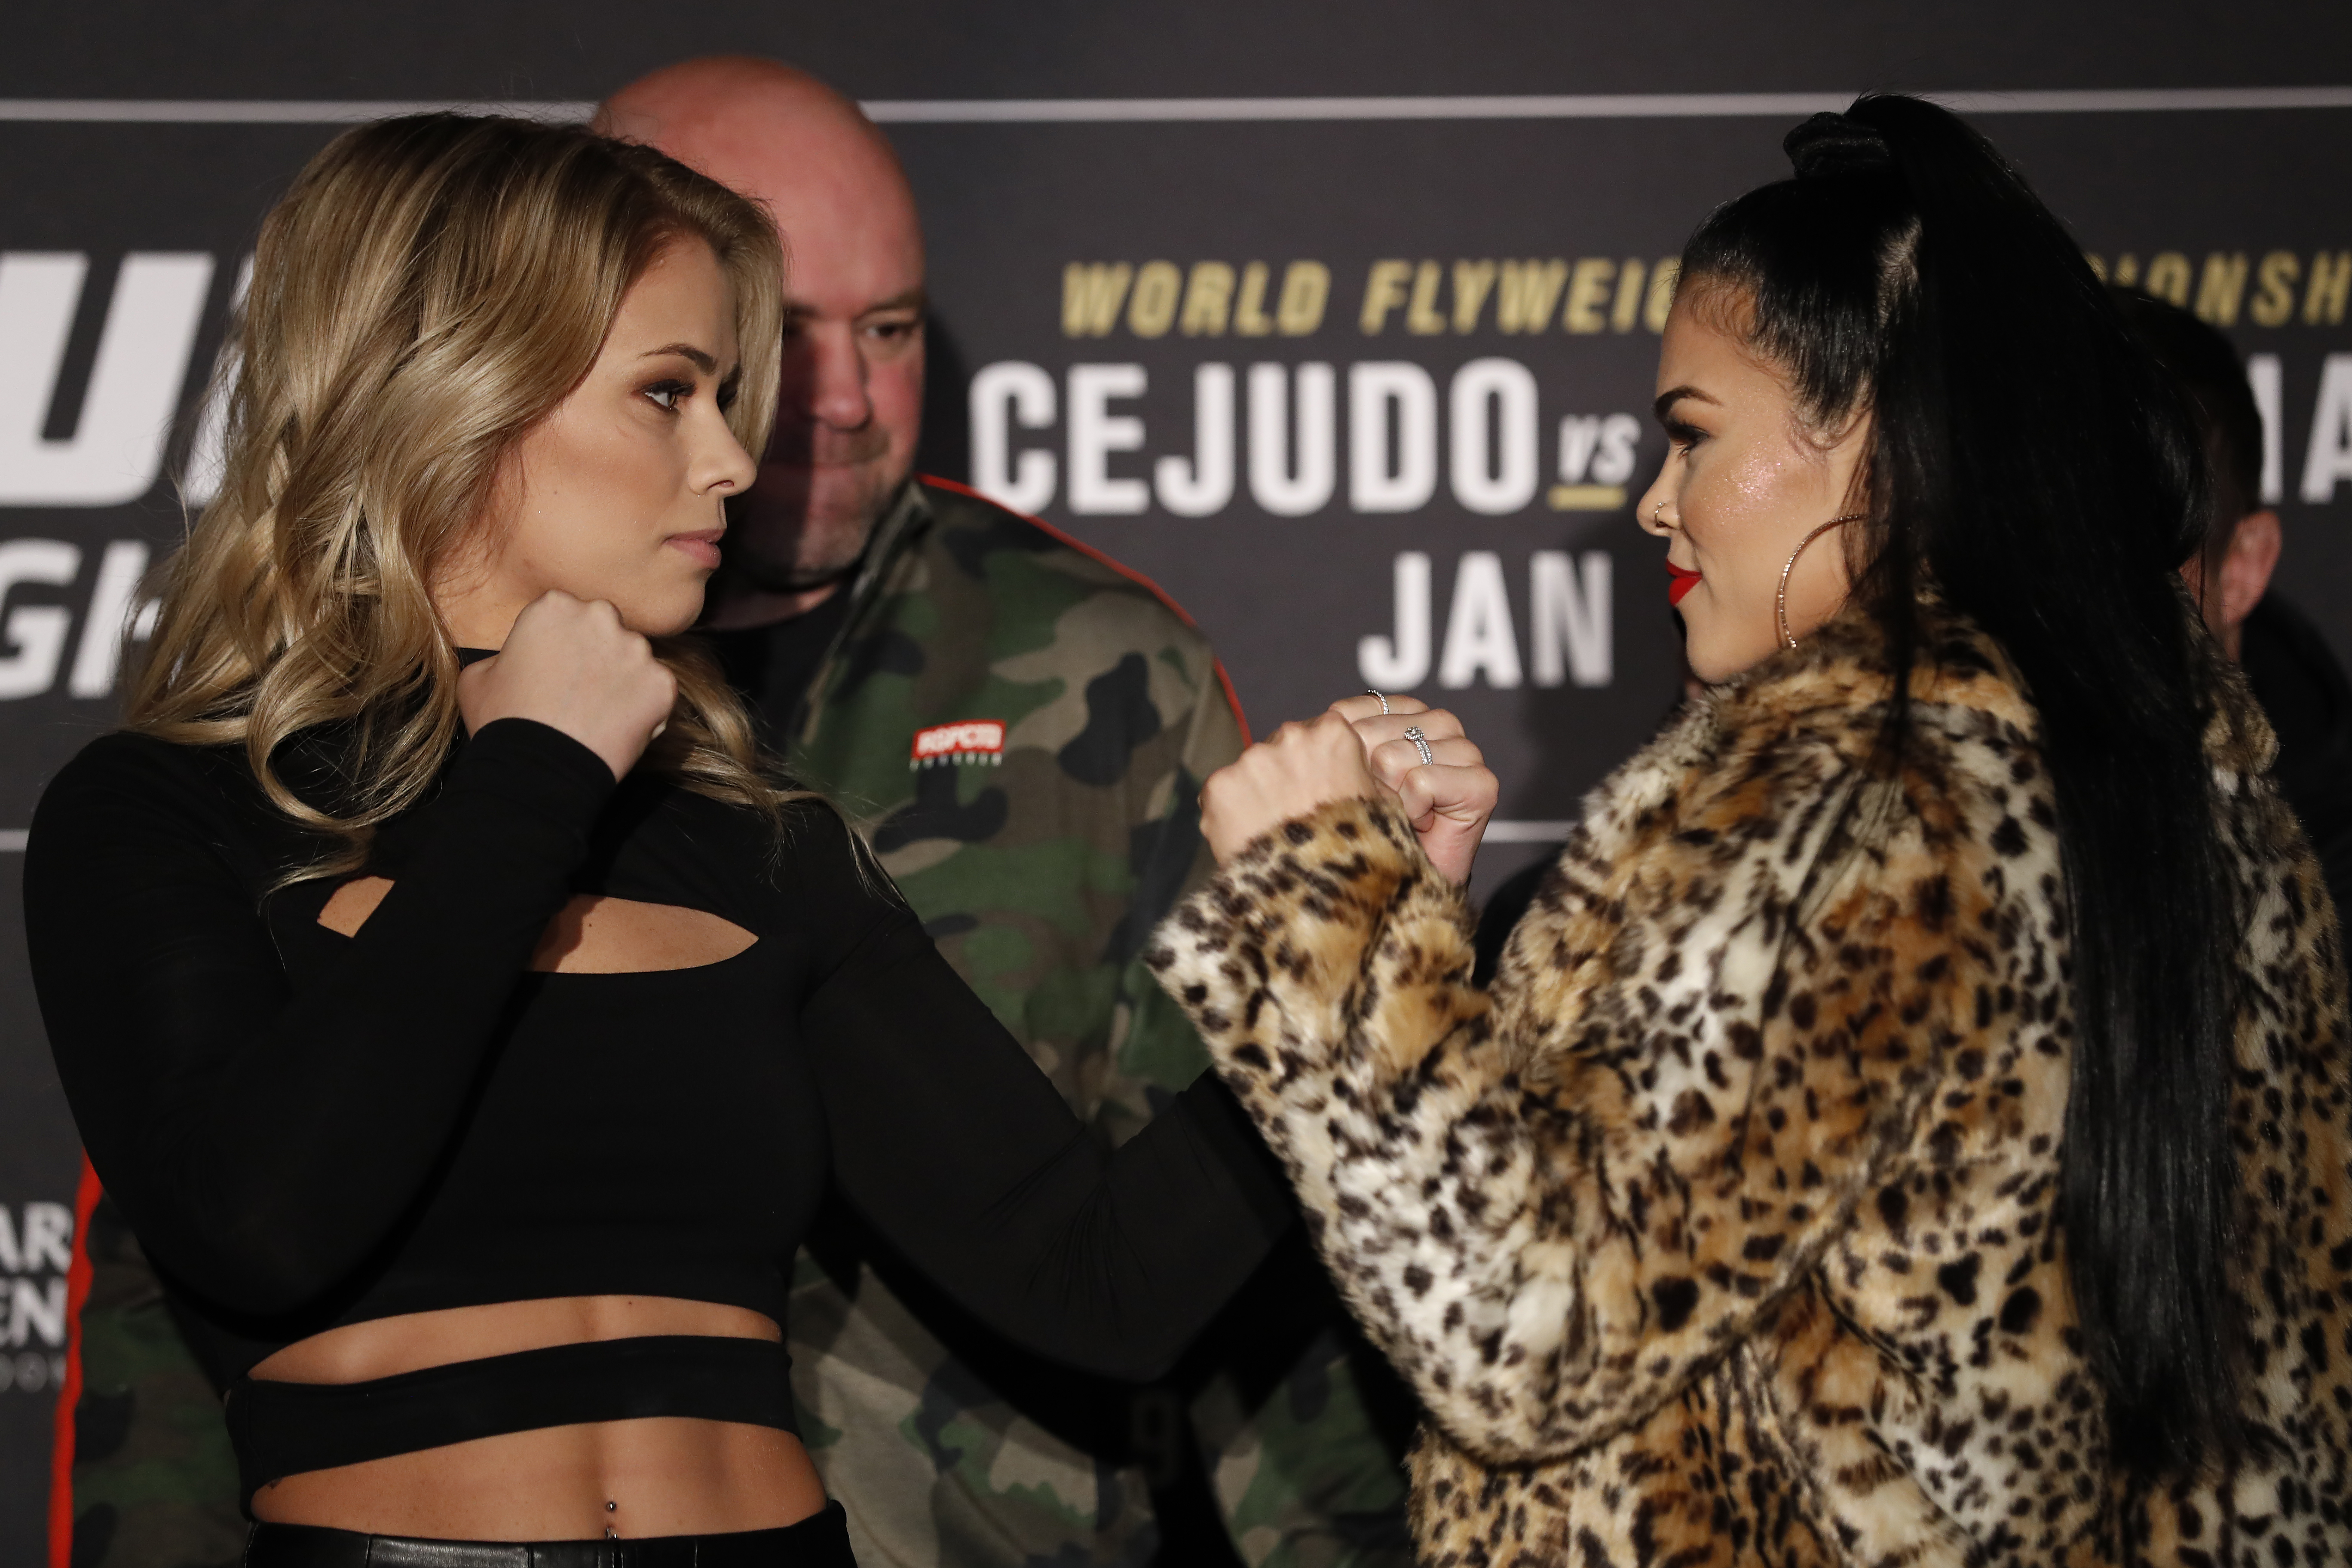 UFC打击夜Cejudo V Dillashaw:终极媒体日